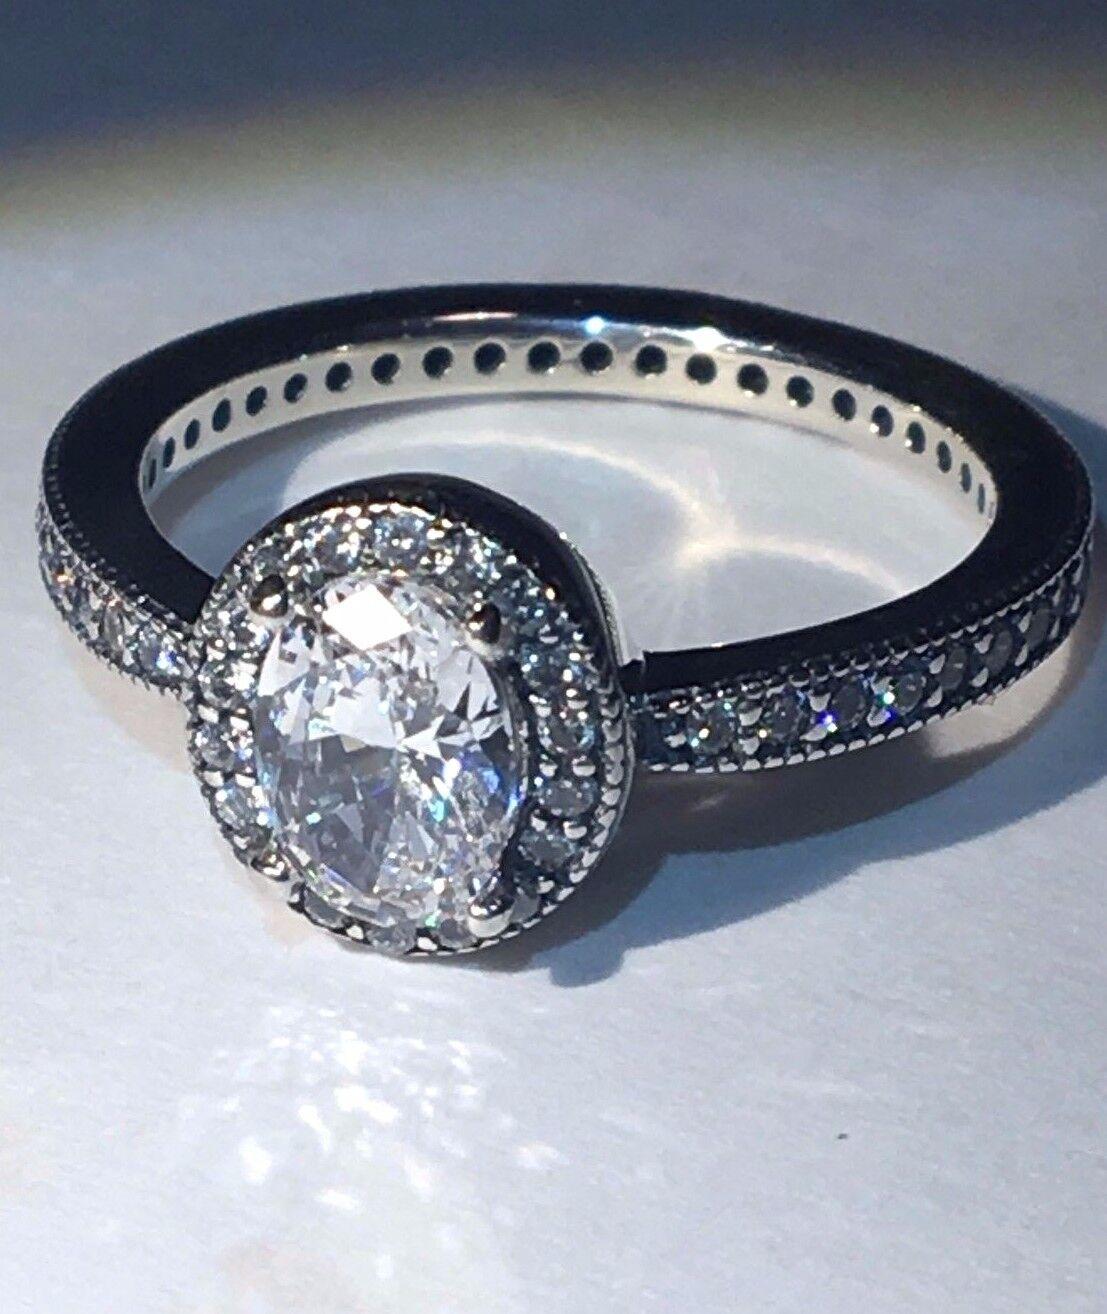 90e5bb7165d15 PANDORA Radiant Elegance Ring S925 Ale Size 52